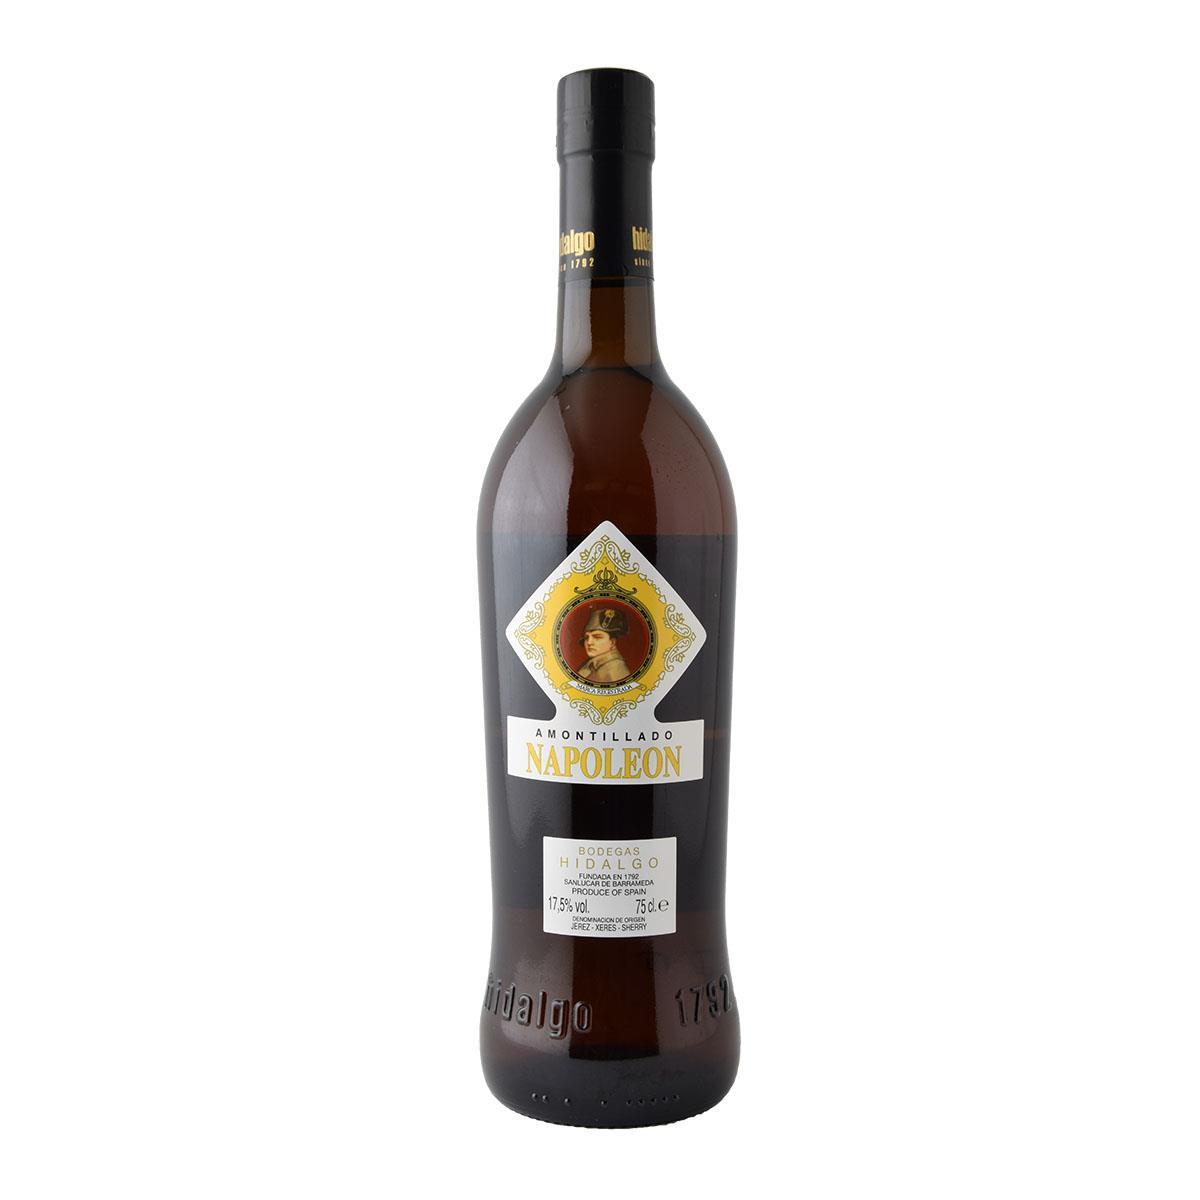 Hidalgo Amontillado Napoleon Sherry 750ml Λευκό